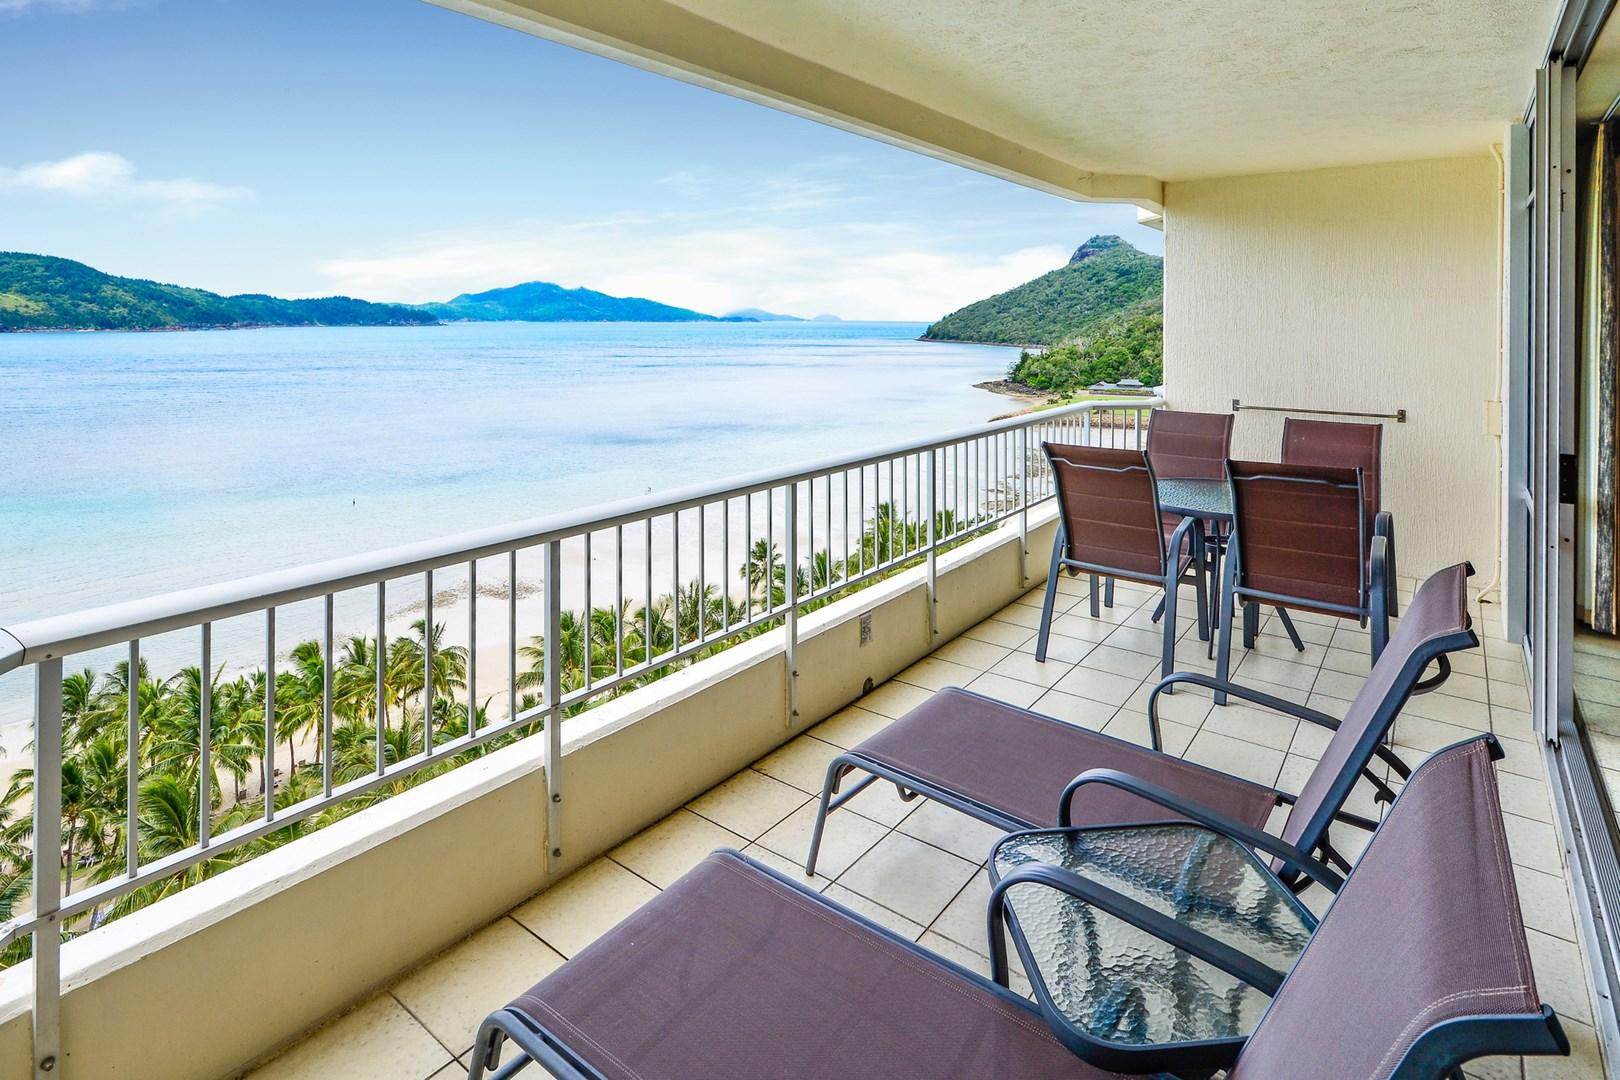 Hamilton Island Real Estate Real Estate Agency In Hamilton Island Qld 4803